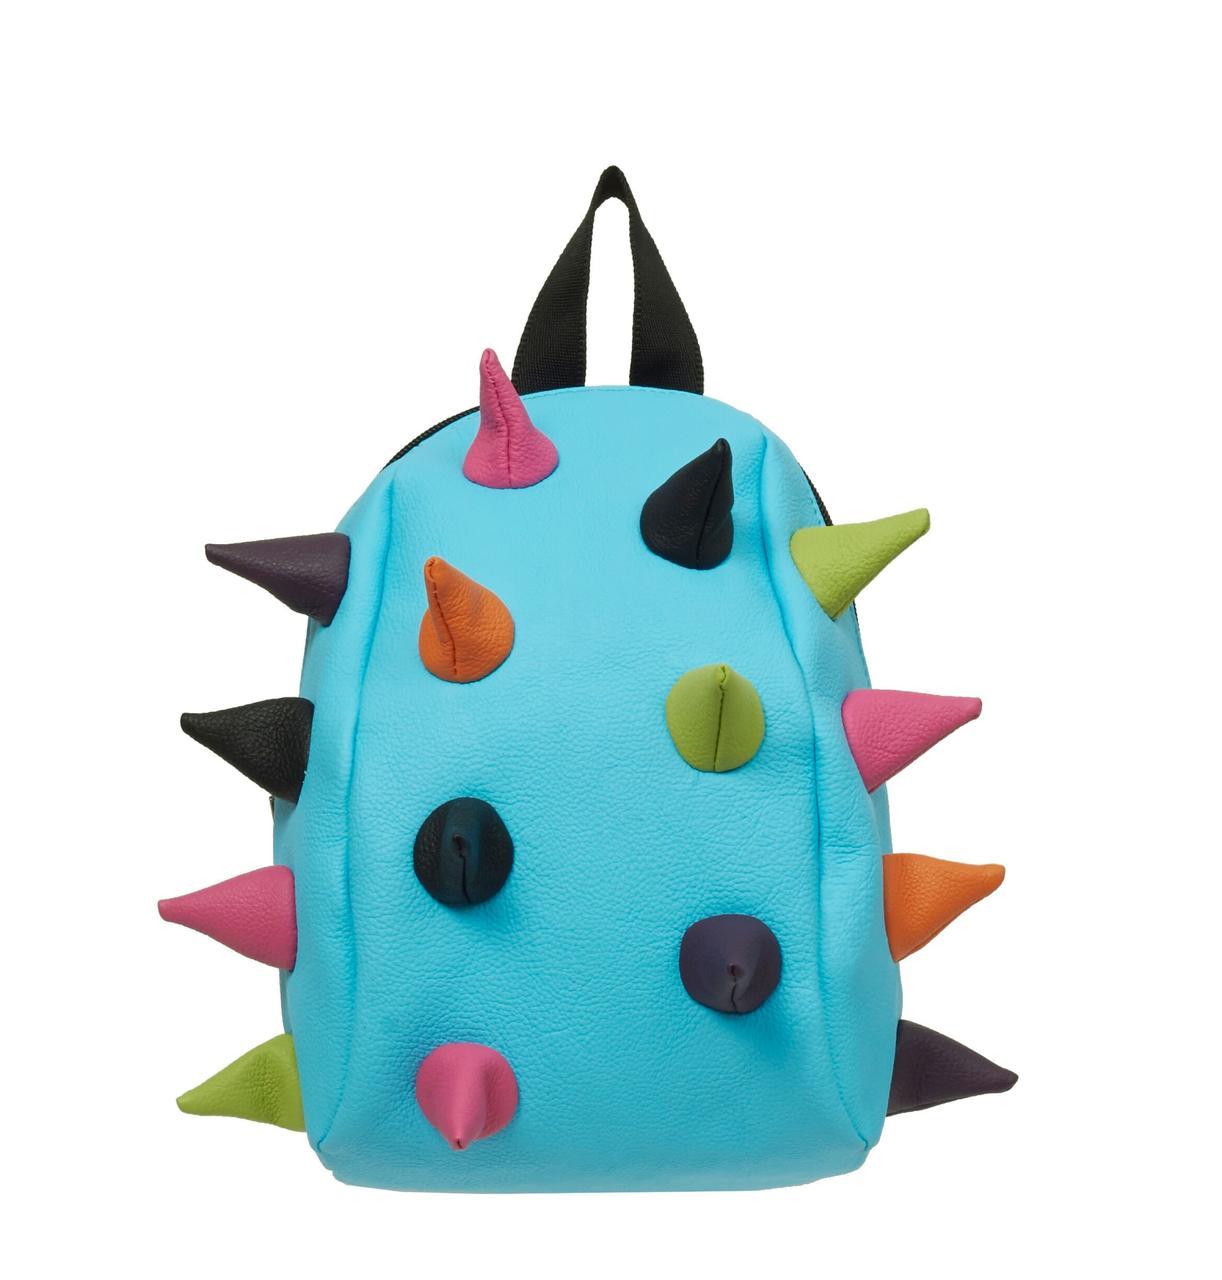 Рюкзак MadPax Rex Mini BP цвет Aqua Multi (голубой мульти)